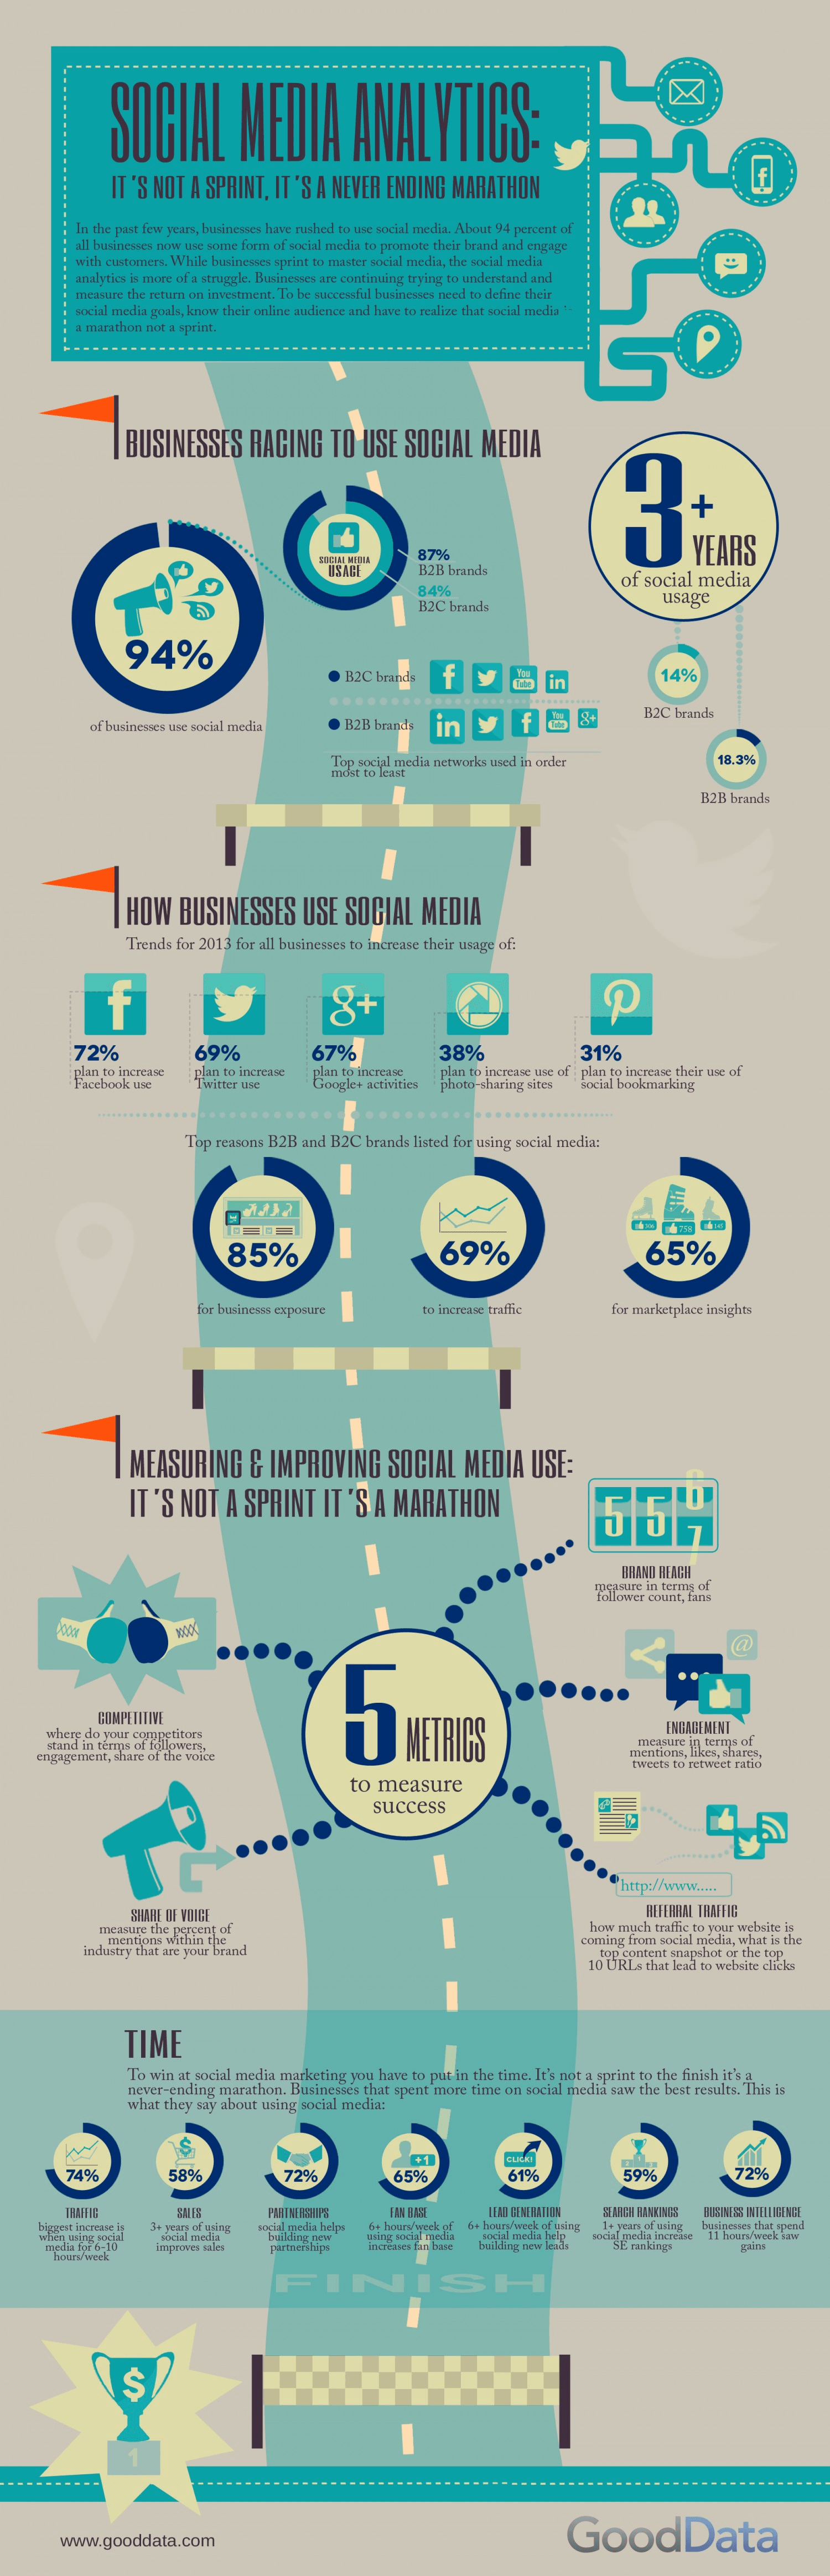 social media analytics infographic